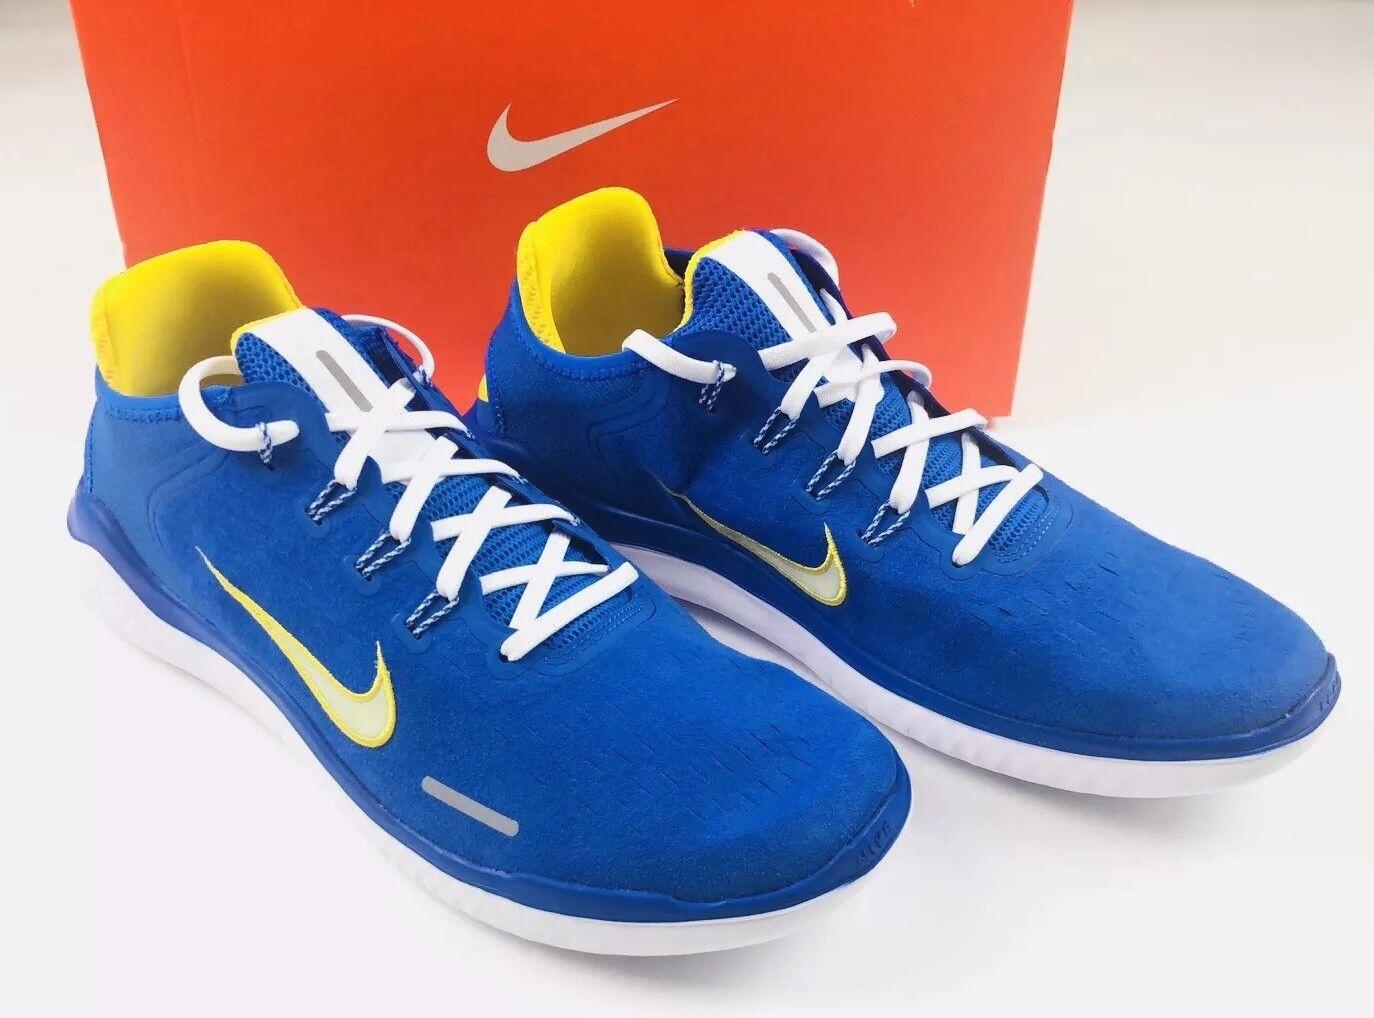 New Nike Free Run RN 2018 DNA shoes bluee Cobalt Citron AH7870 400 Mens Sz 11